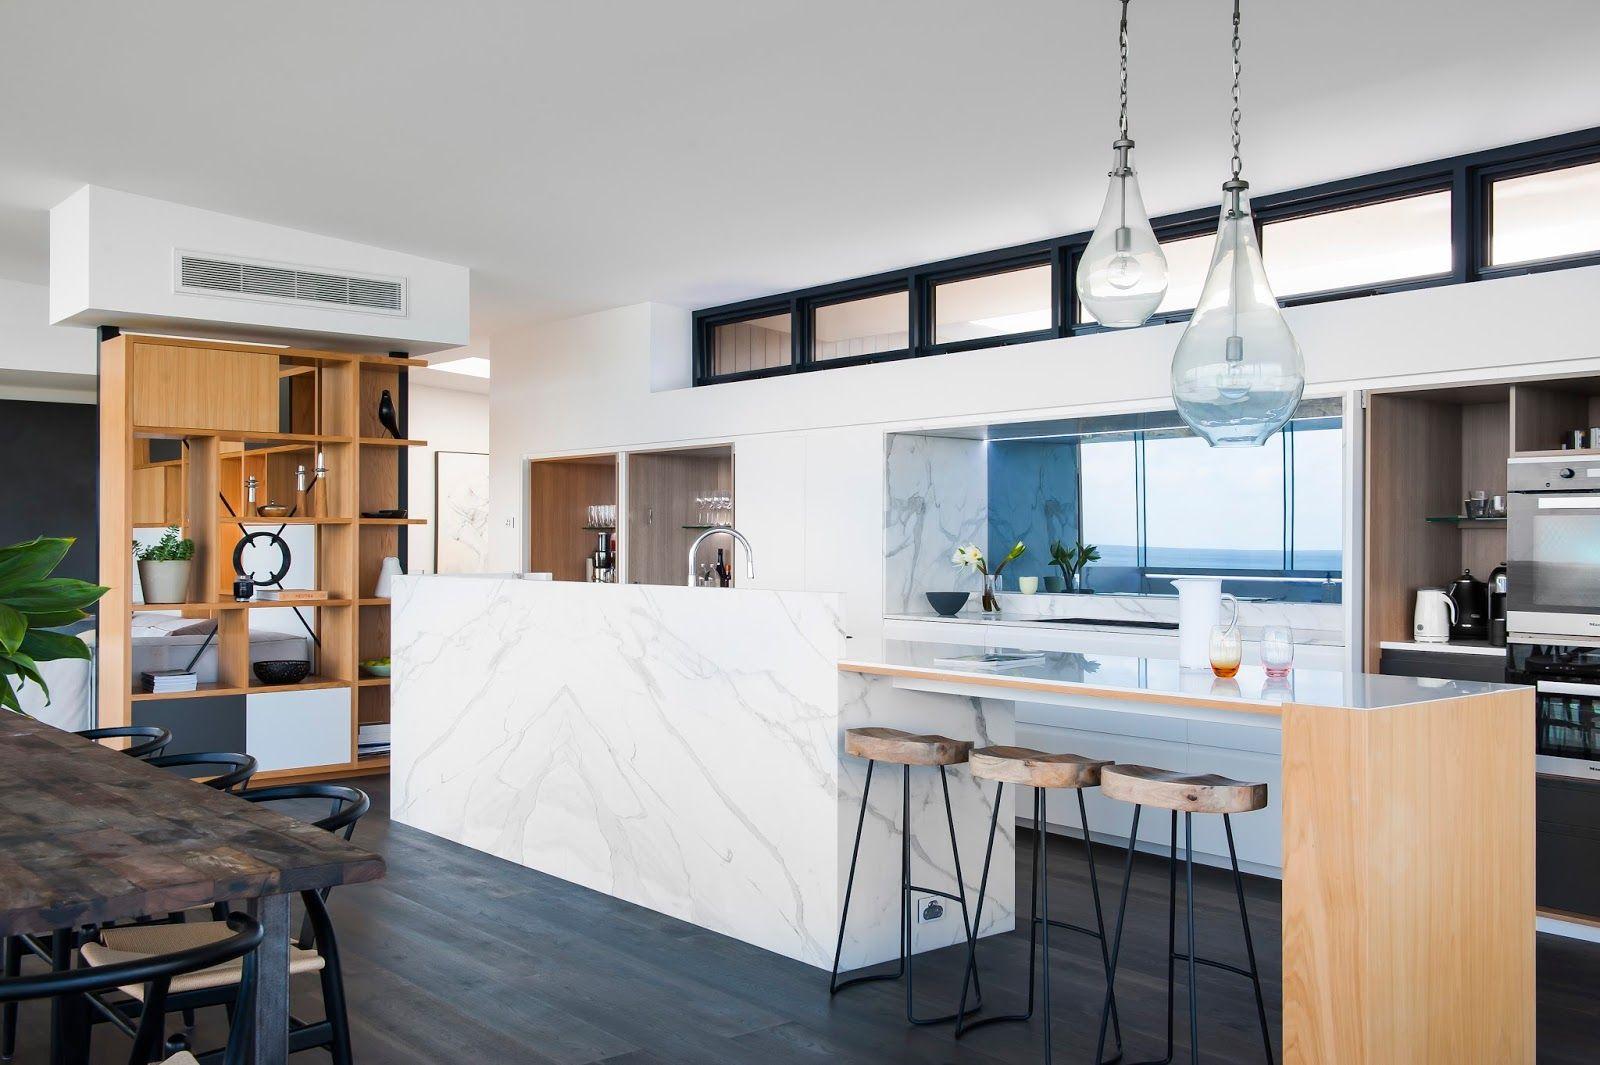 Superior Modern Kitchen And Bathroom Design Solutions.award Winning Design Studio  For The Kitchen U0026 Bathroom